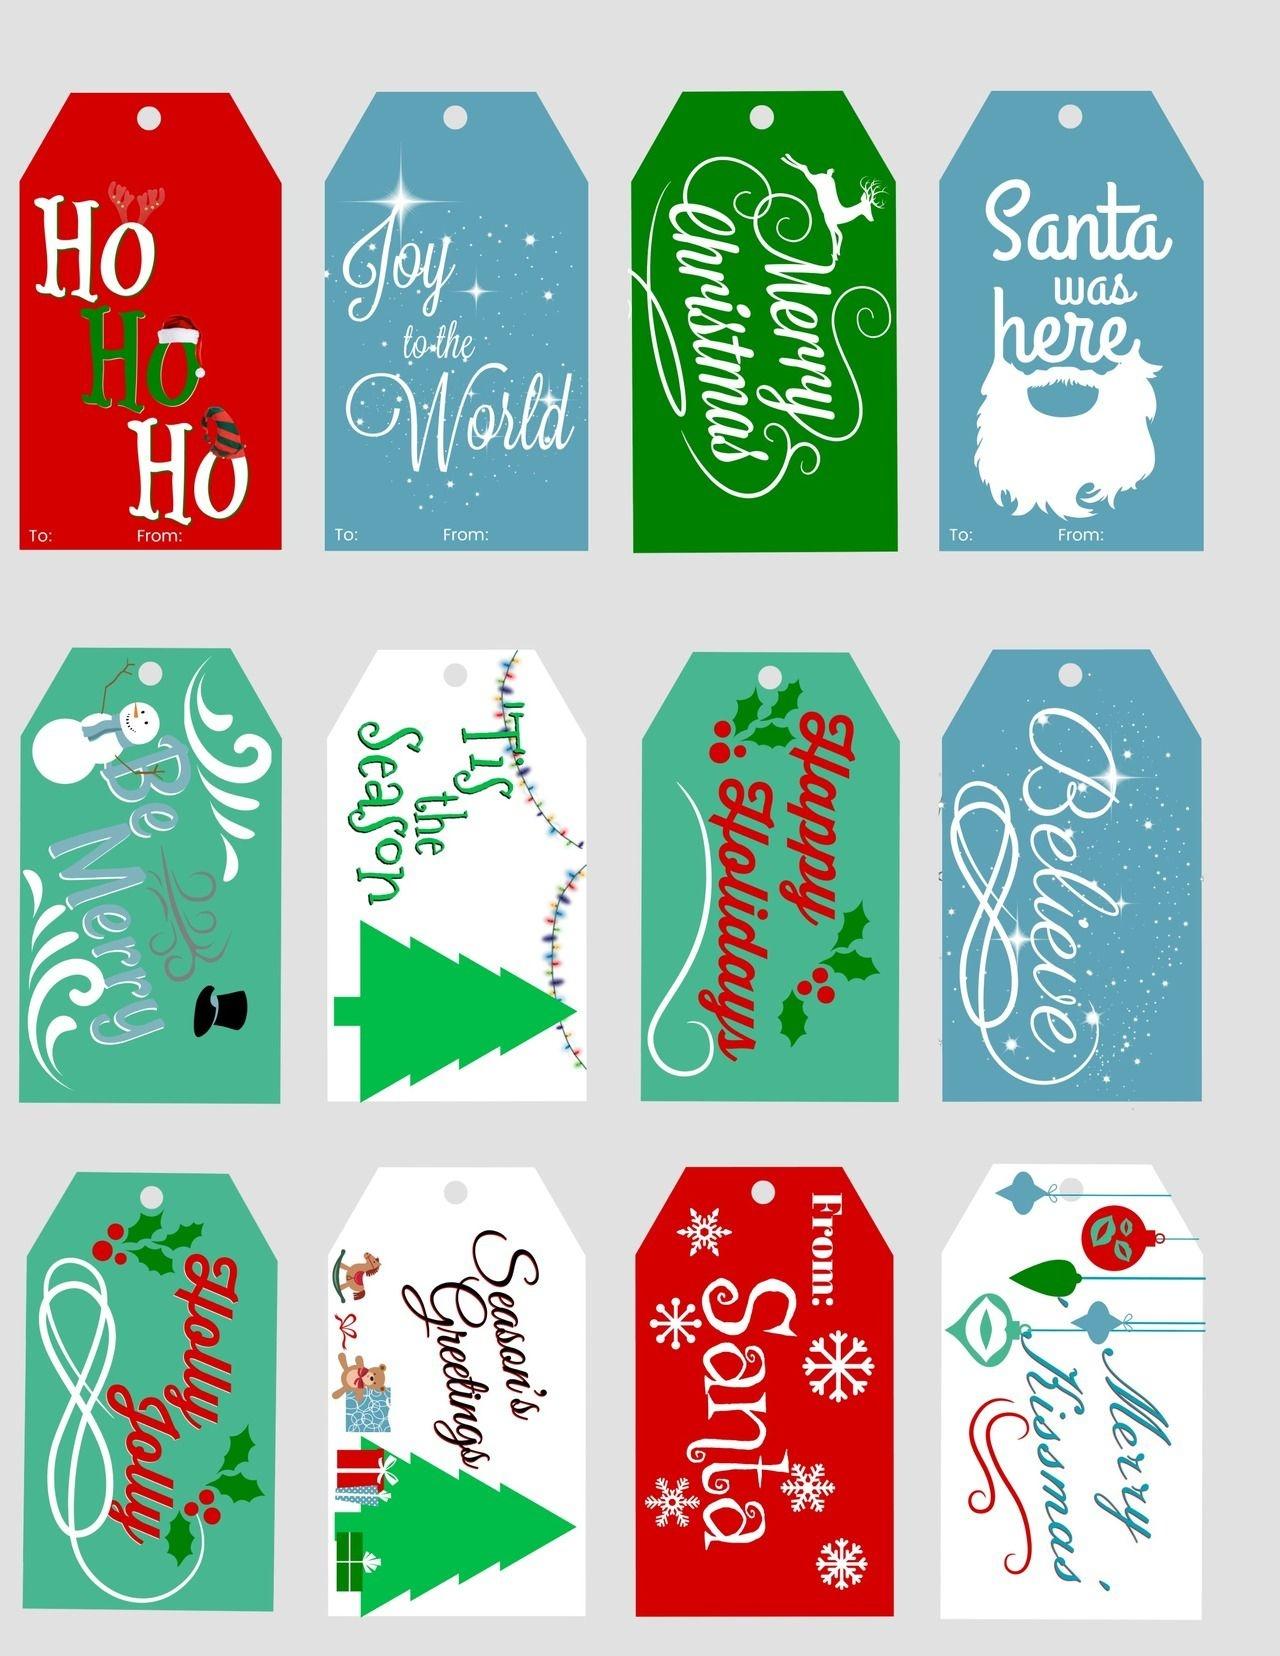 Free Printable Stickers For Christmas, Teachers, Planning, And More - Free Printable Stickers For Teachers